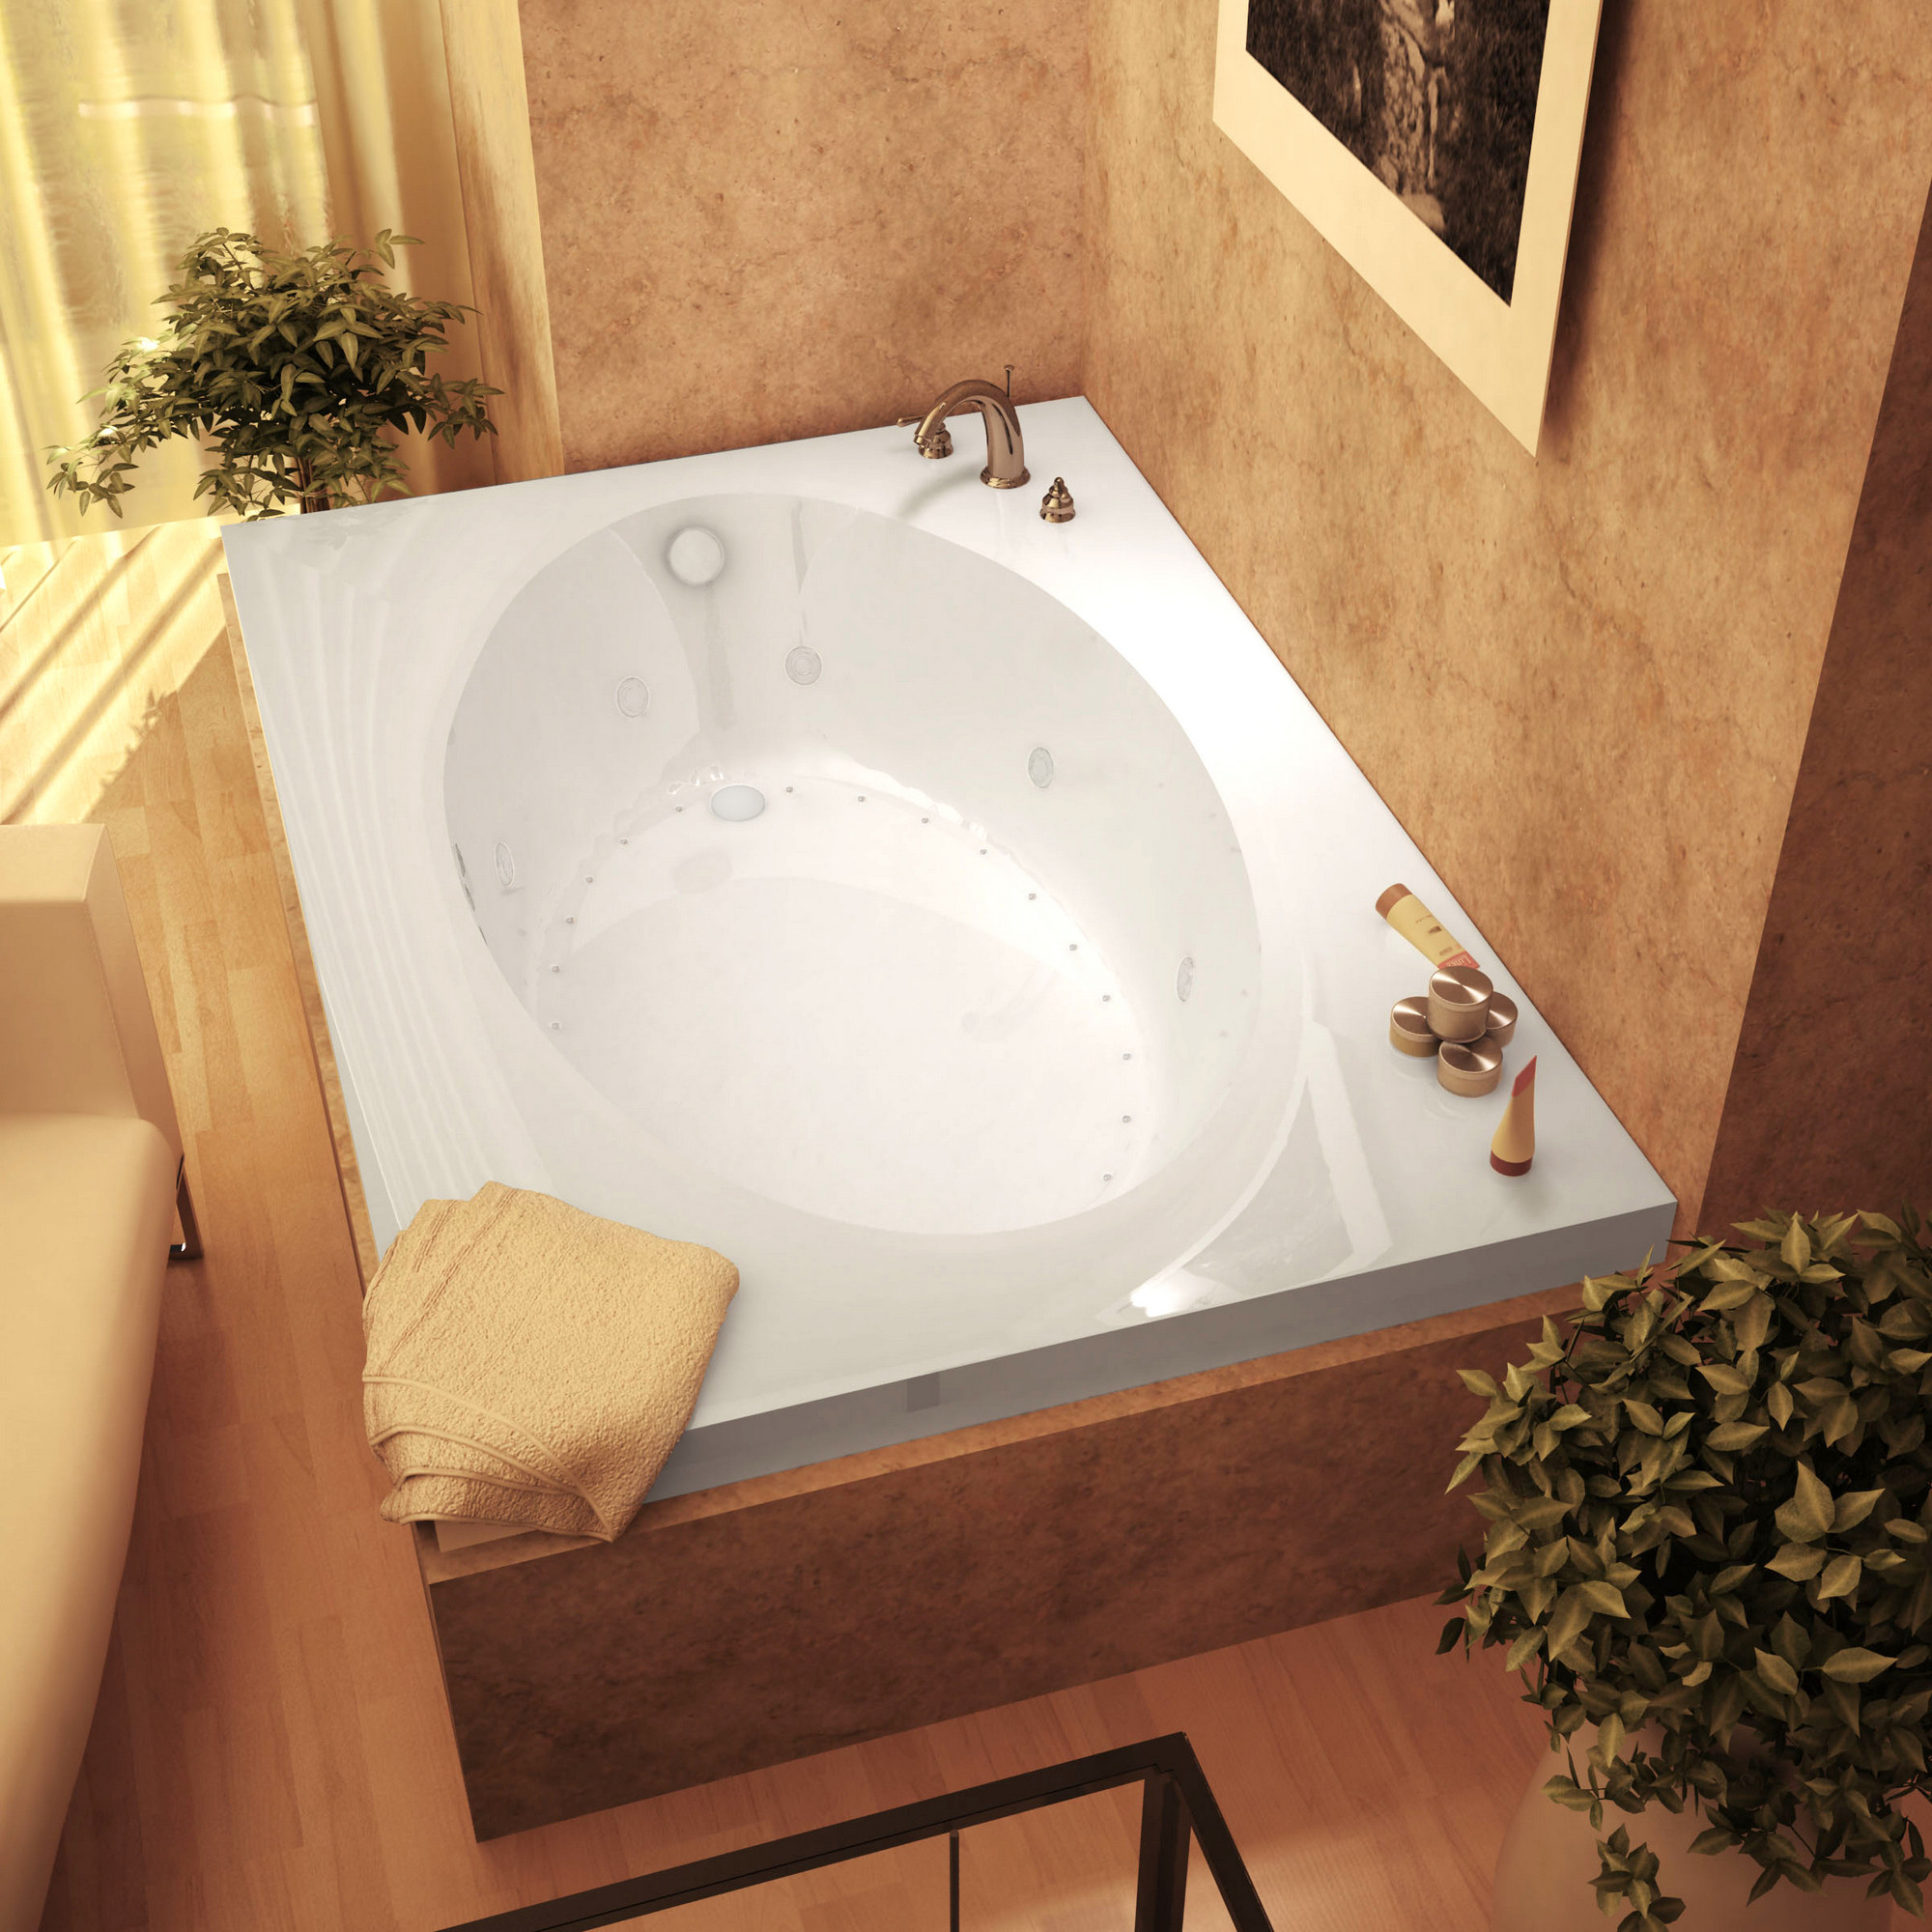 MediTub 4260VDL Atlantis Vogue Air & Whirlpool Jet Bathtub With Left Drain